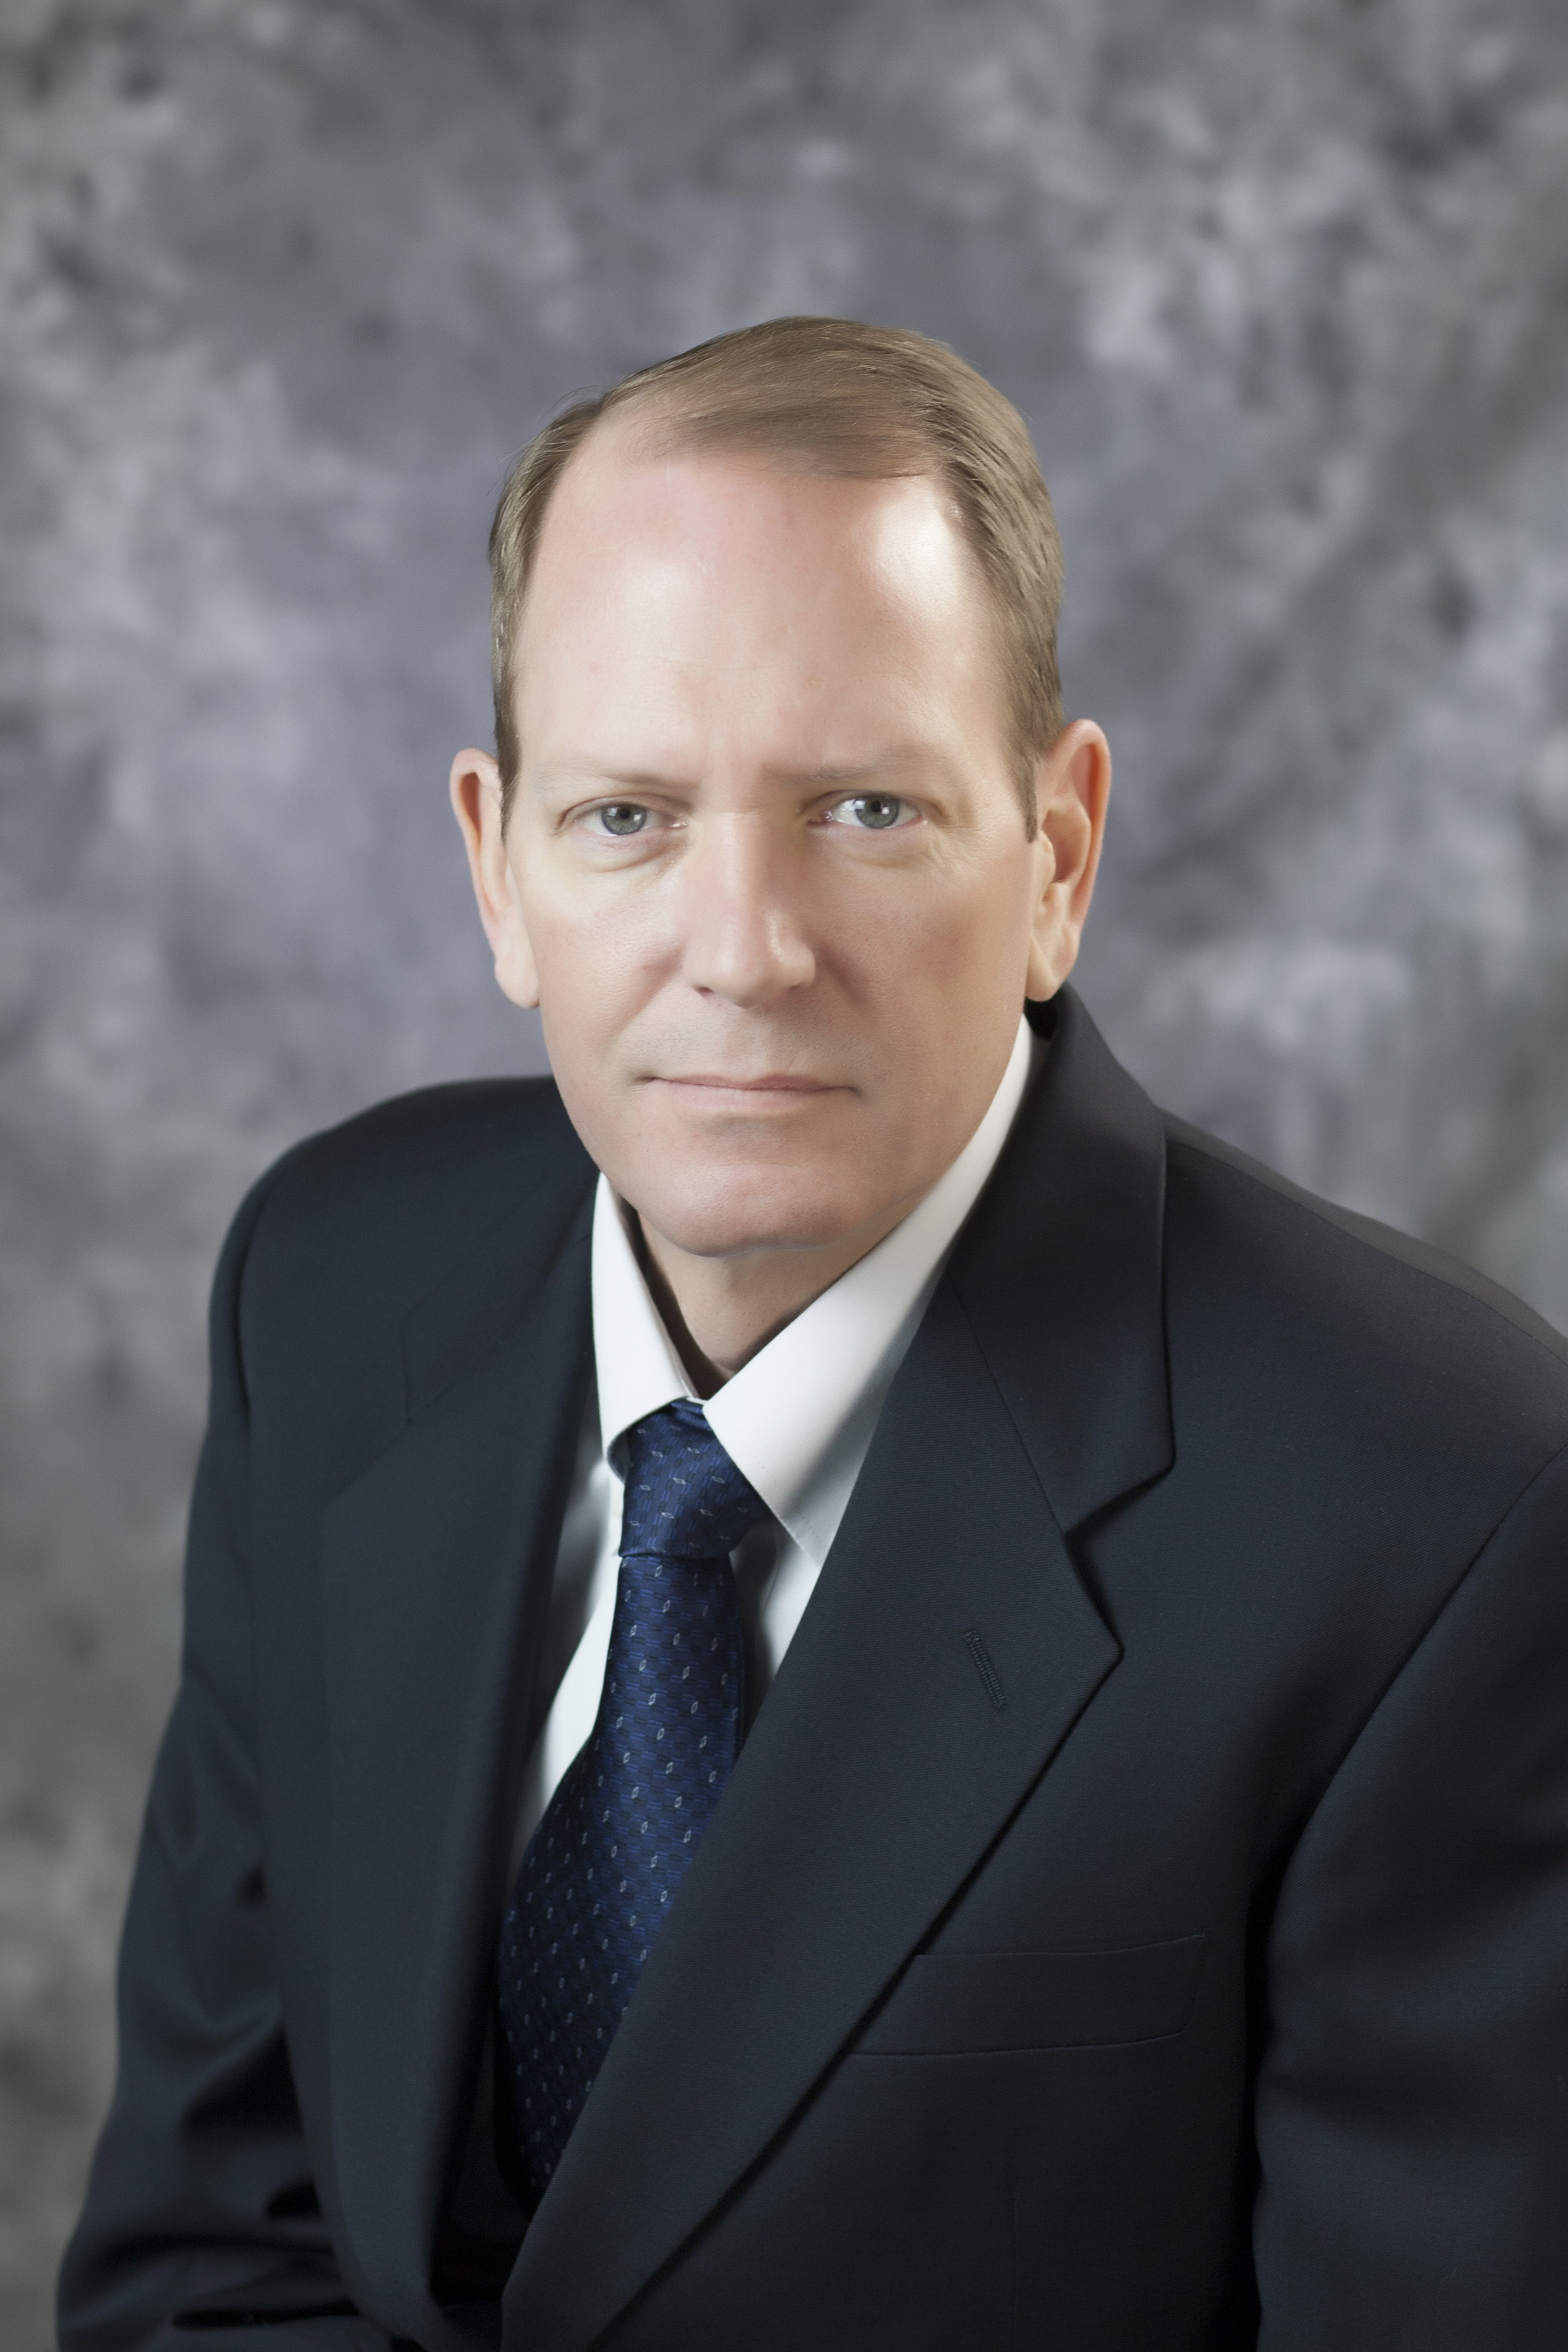 Hallchad Alan Turner Died